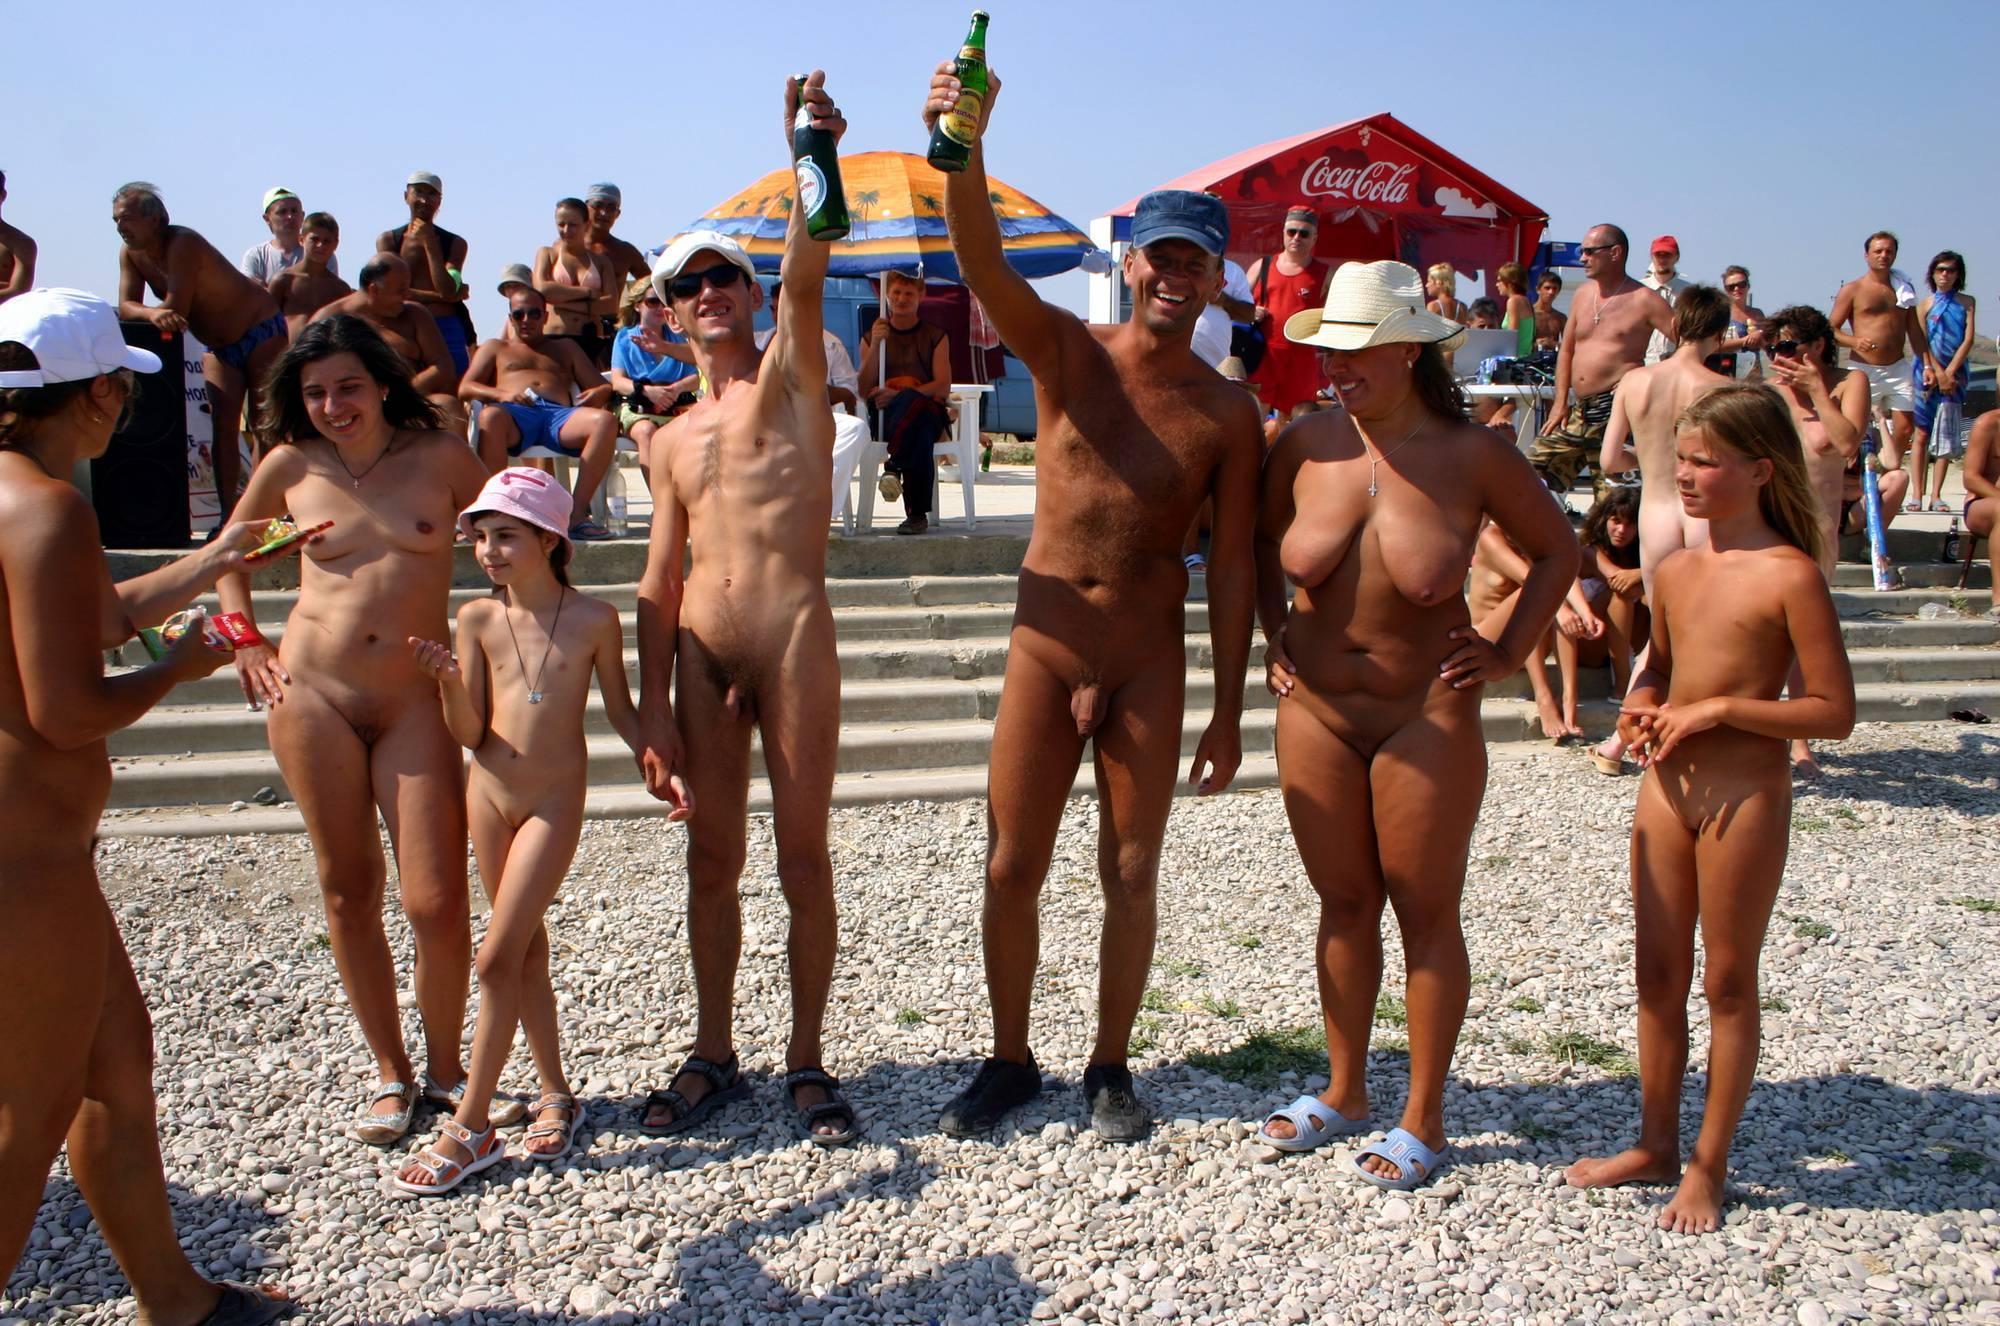 Nudist Show Family Photo - 1